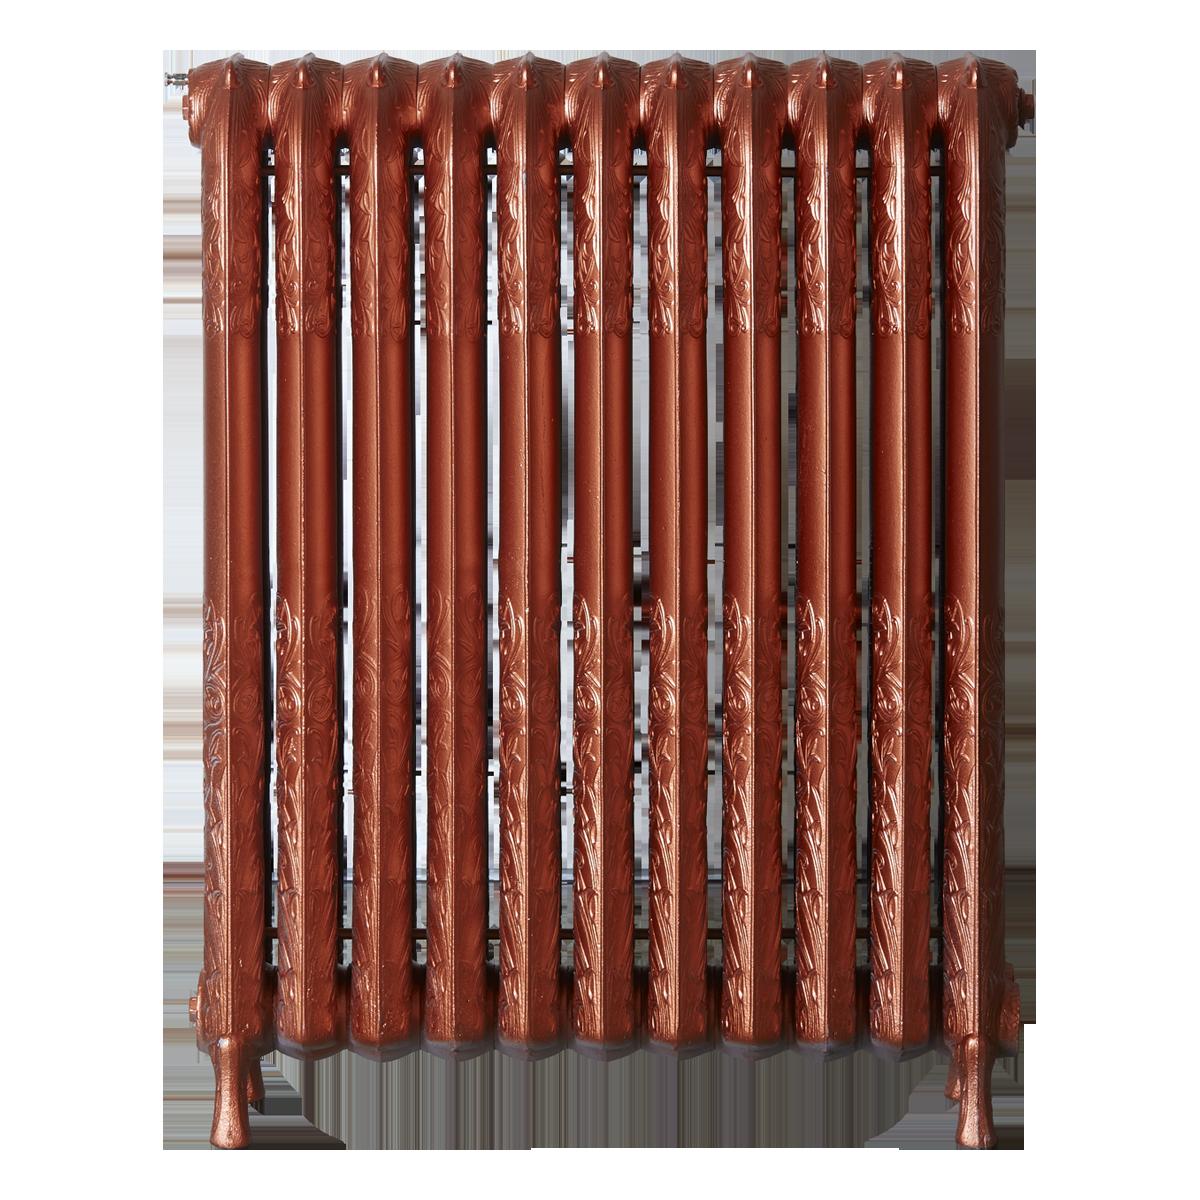 Ironworks Radiators Inc. refurbished cast iron radiator Briar Hill in Copper Metallic